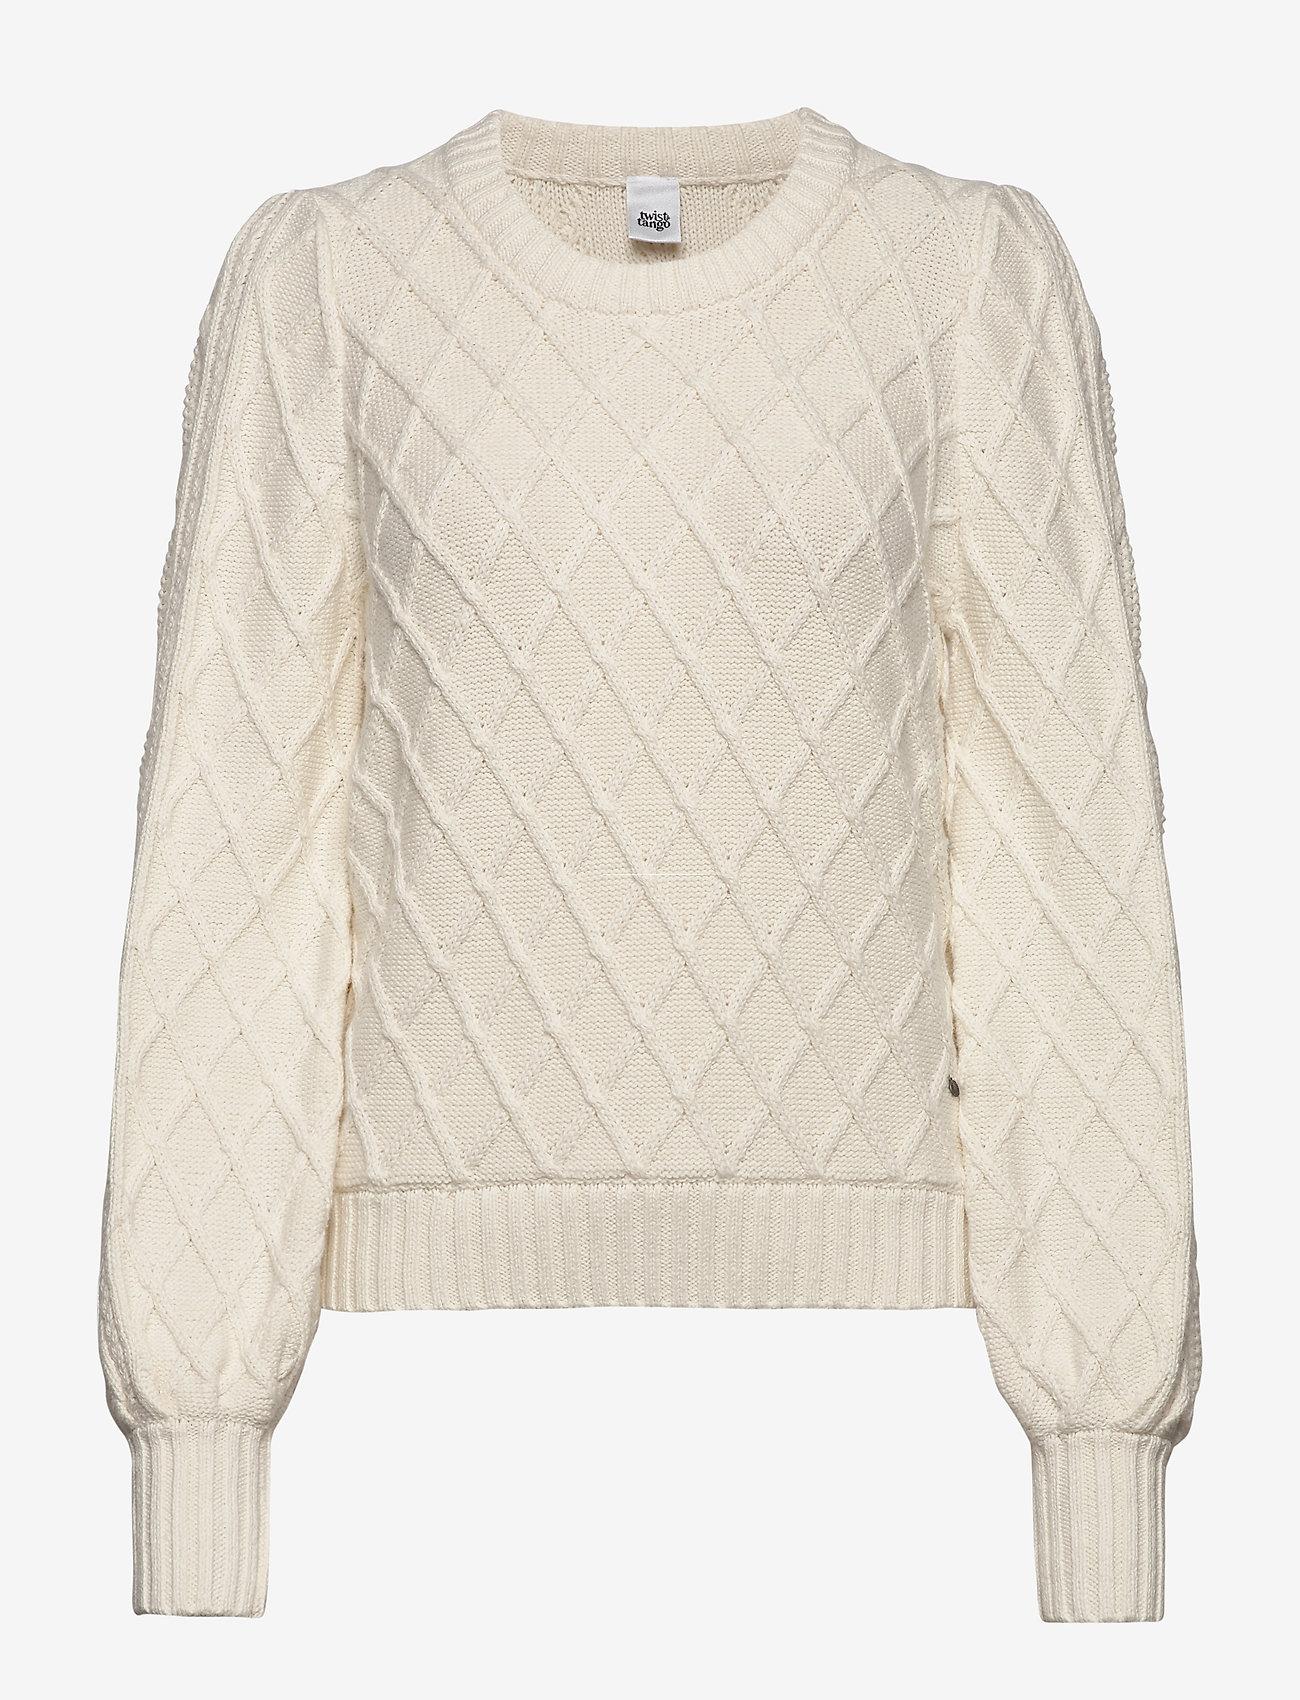 Alva Sweater (Eggshell) - Twist & Tango h5zMOh